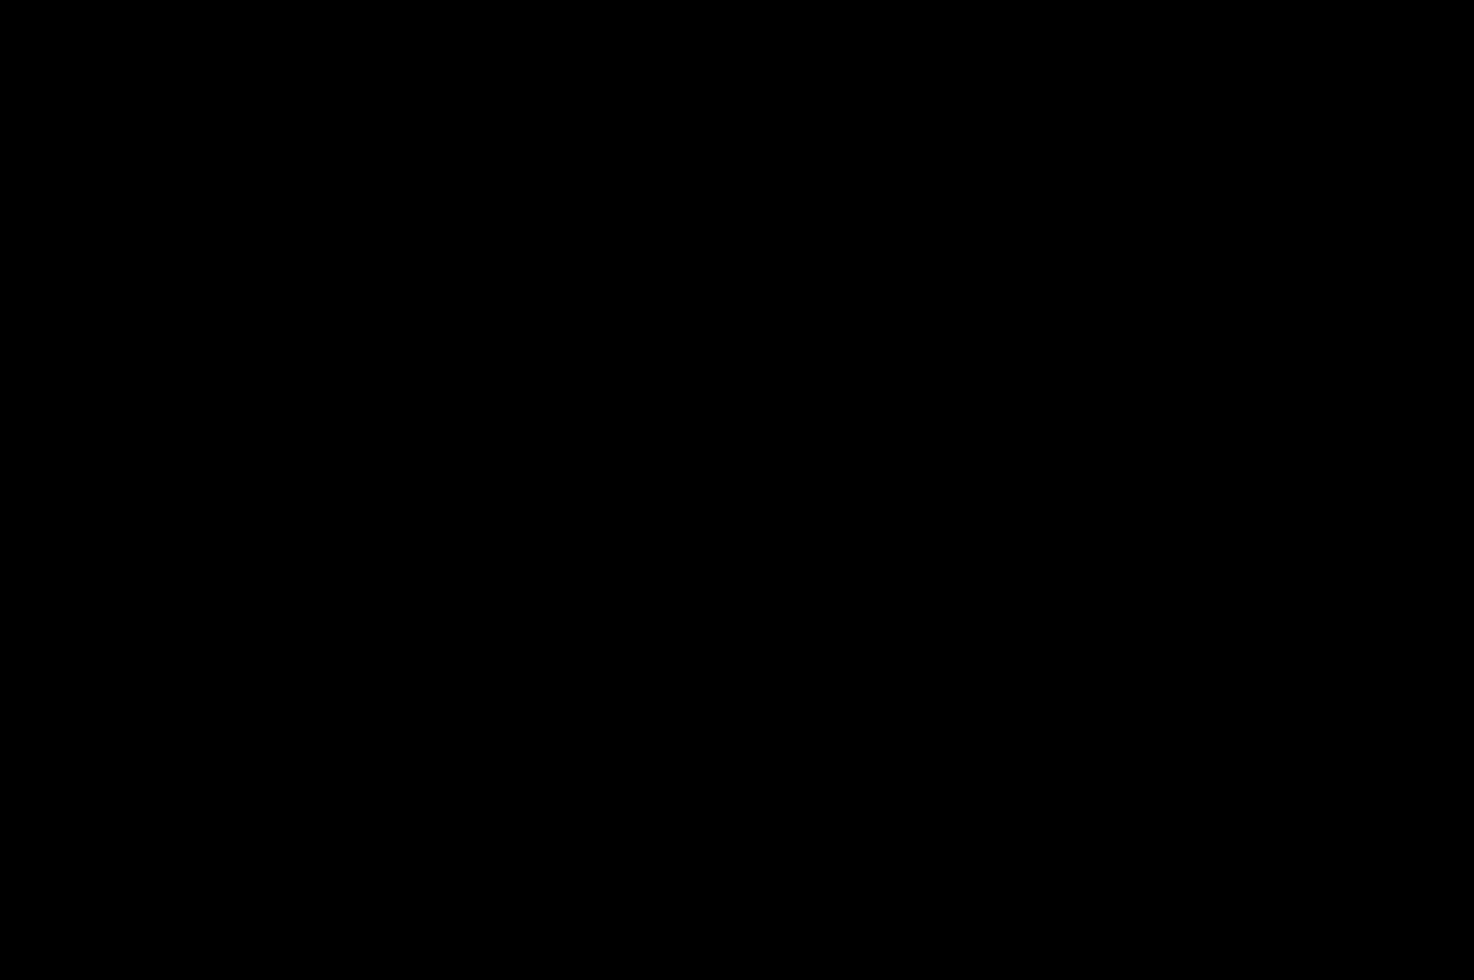 S-(2E)-2-Octenoate Coenzyme A